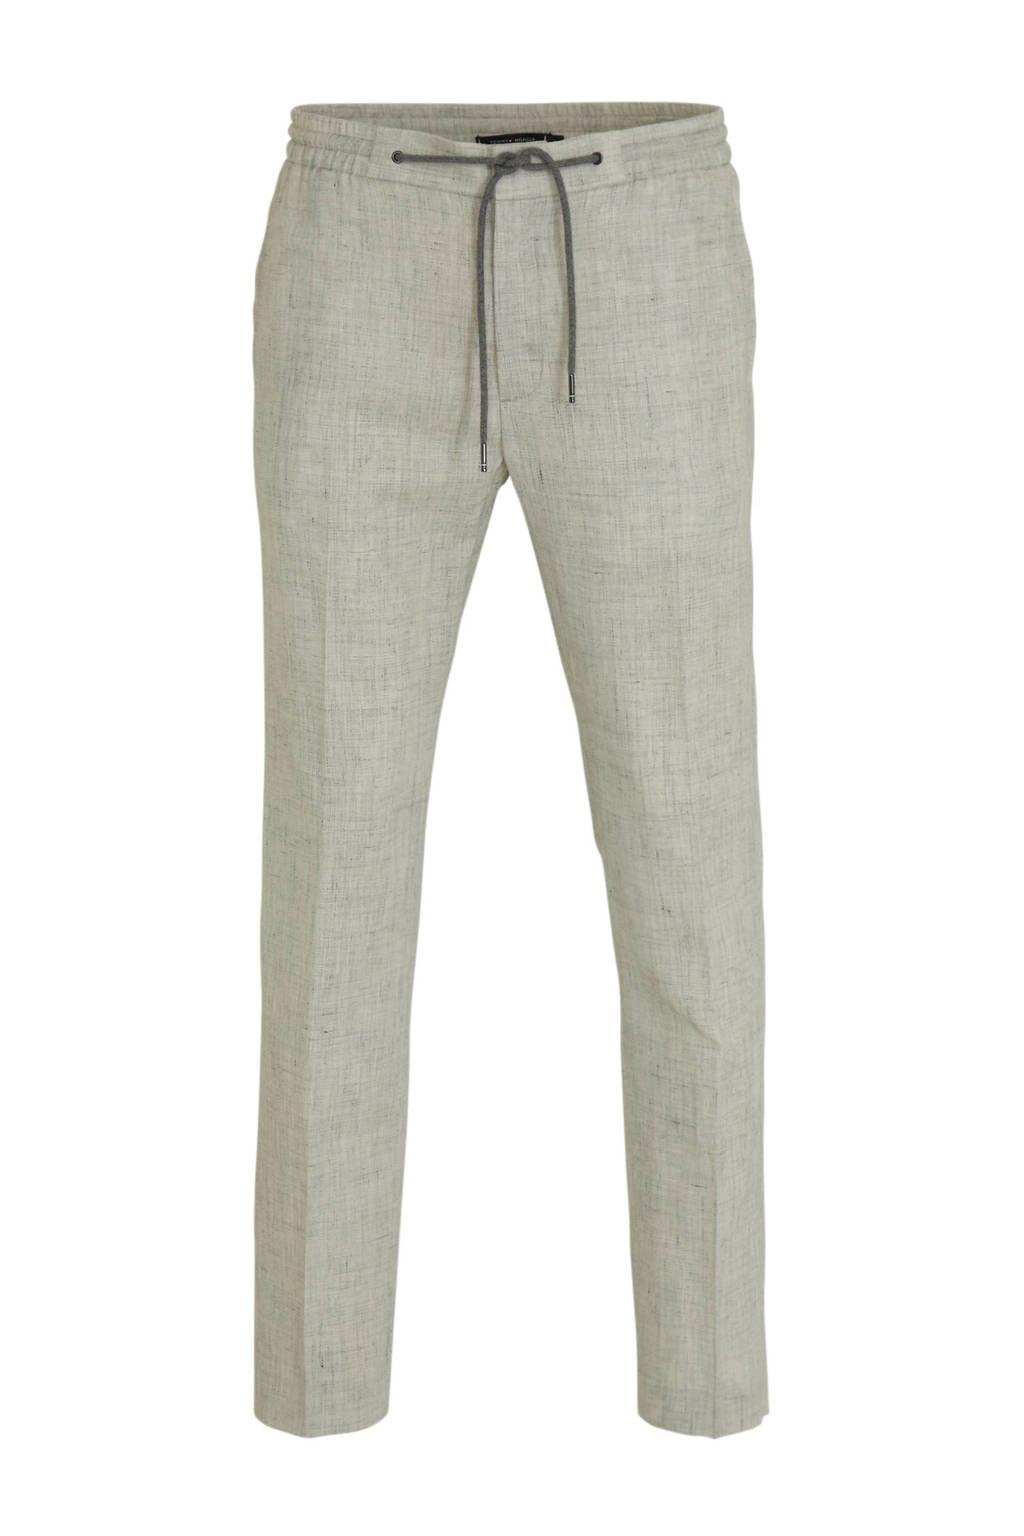 Tommy Hilfiger Tailored slim fit pantalon met linnen grijs, Grijs